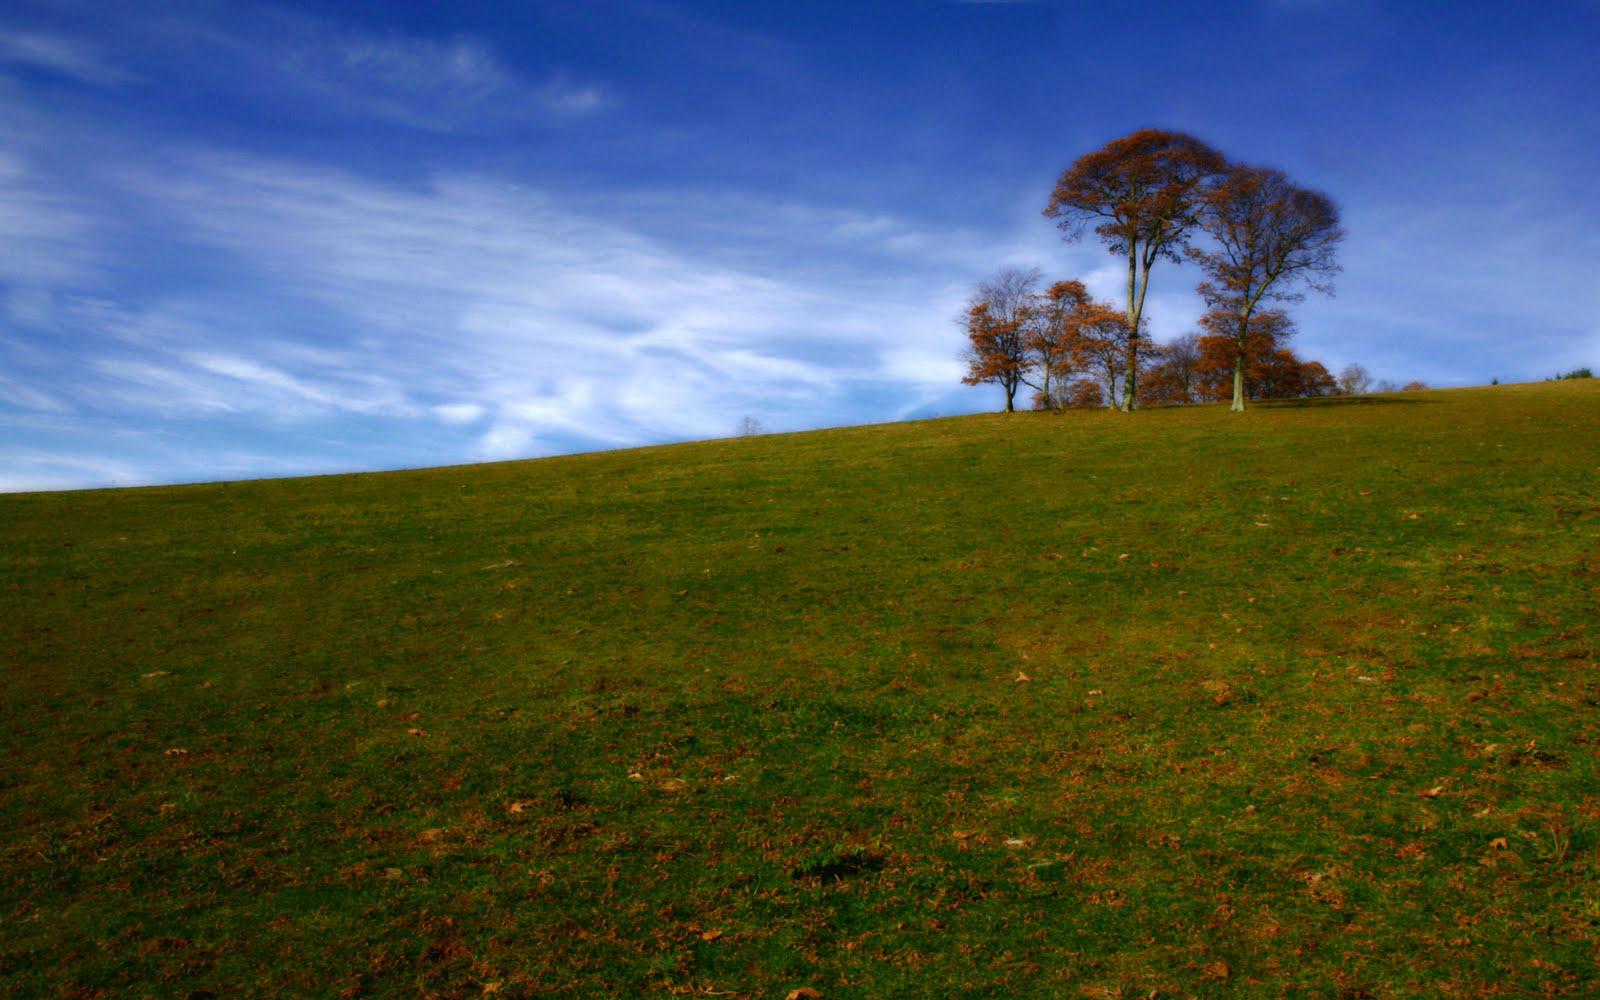 indian nature wallpaper,sky,nature,grassland,natural landscape,green